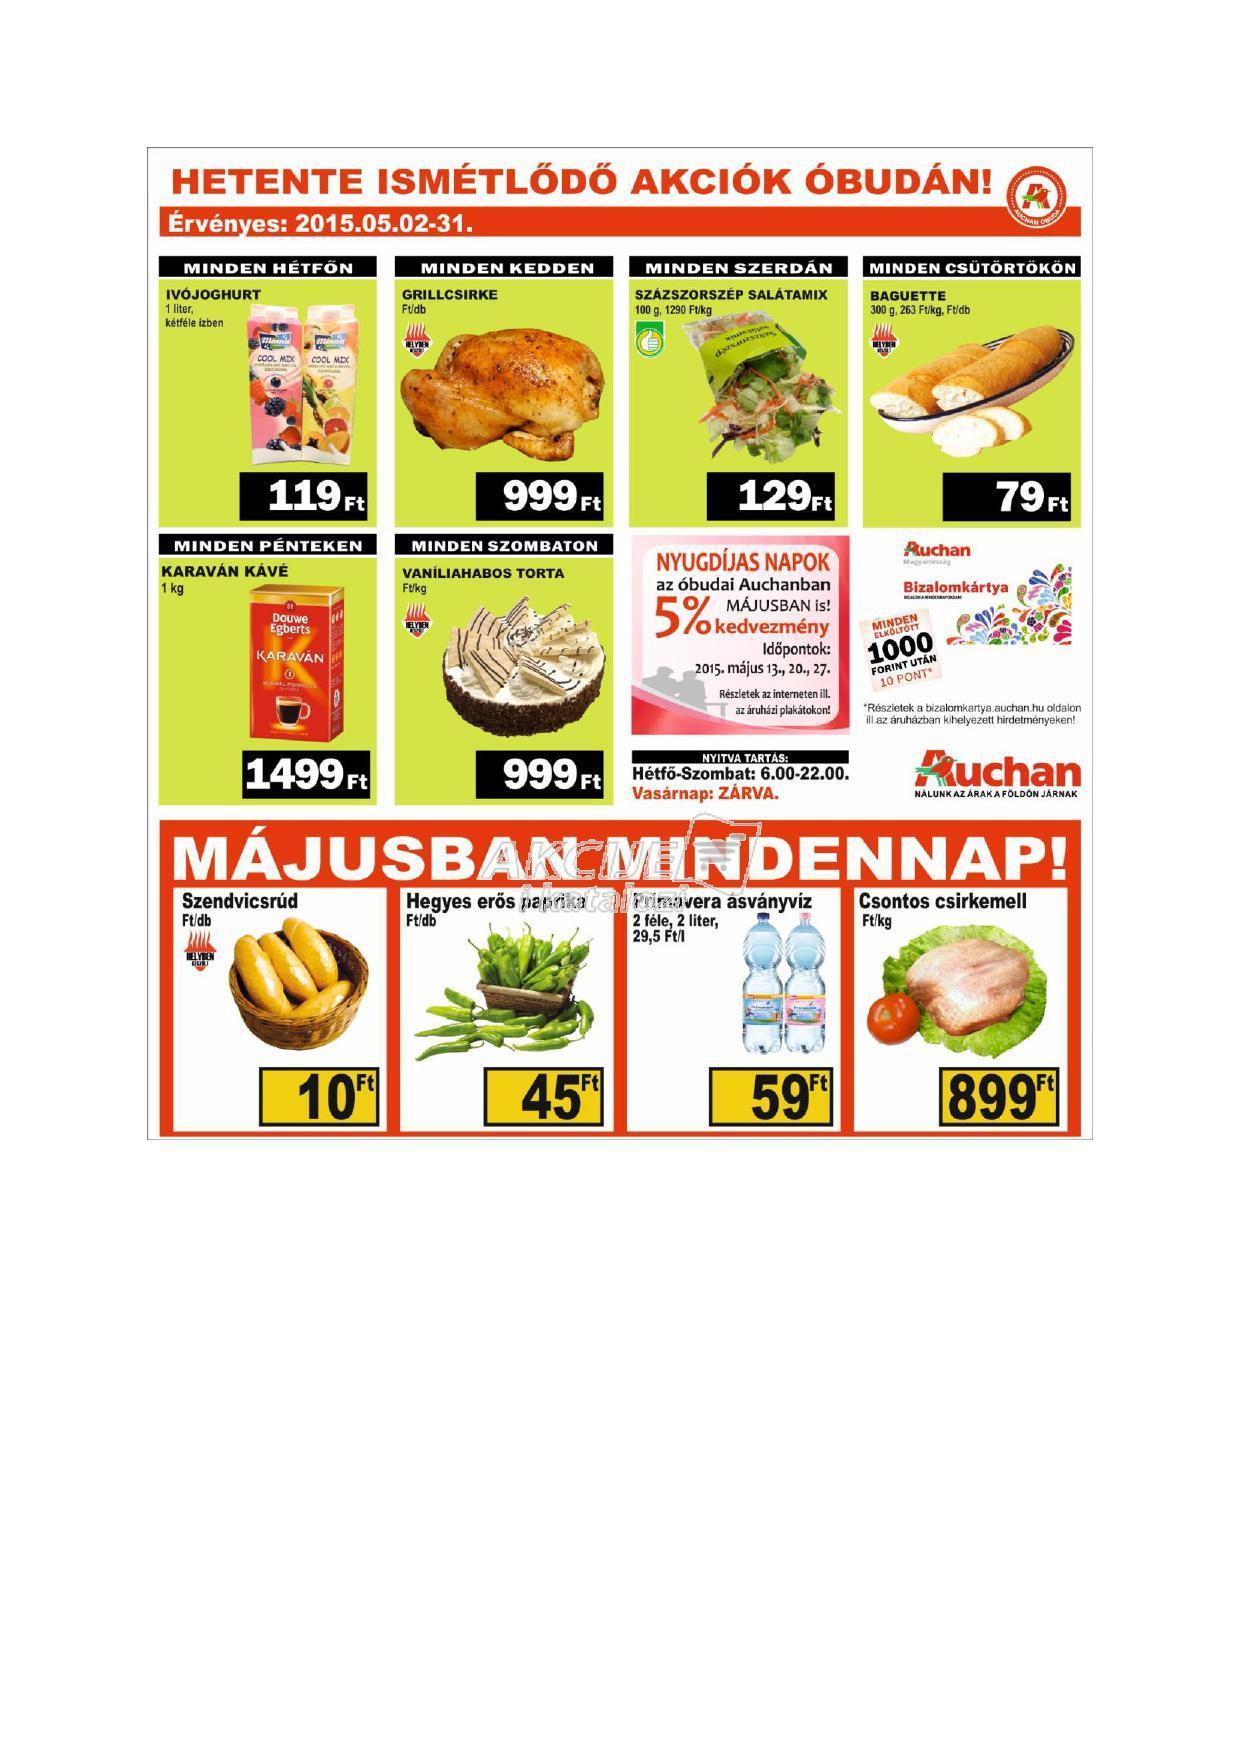 Auchan akcija super cena